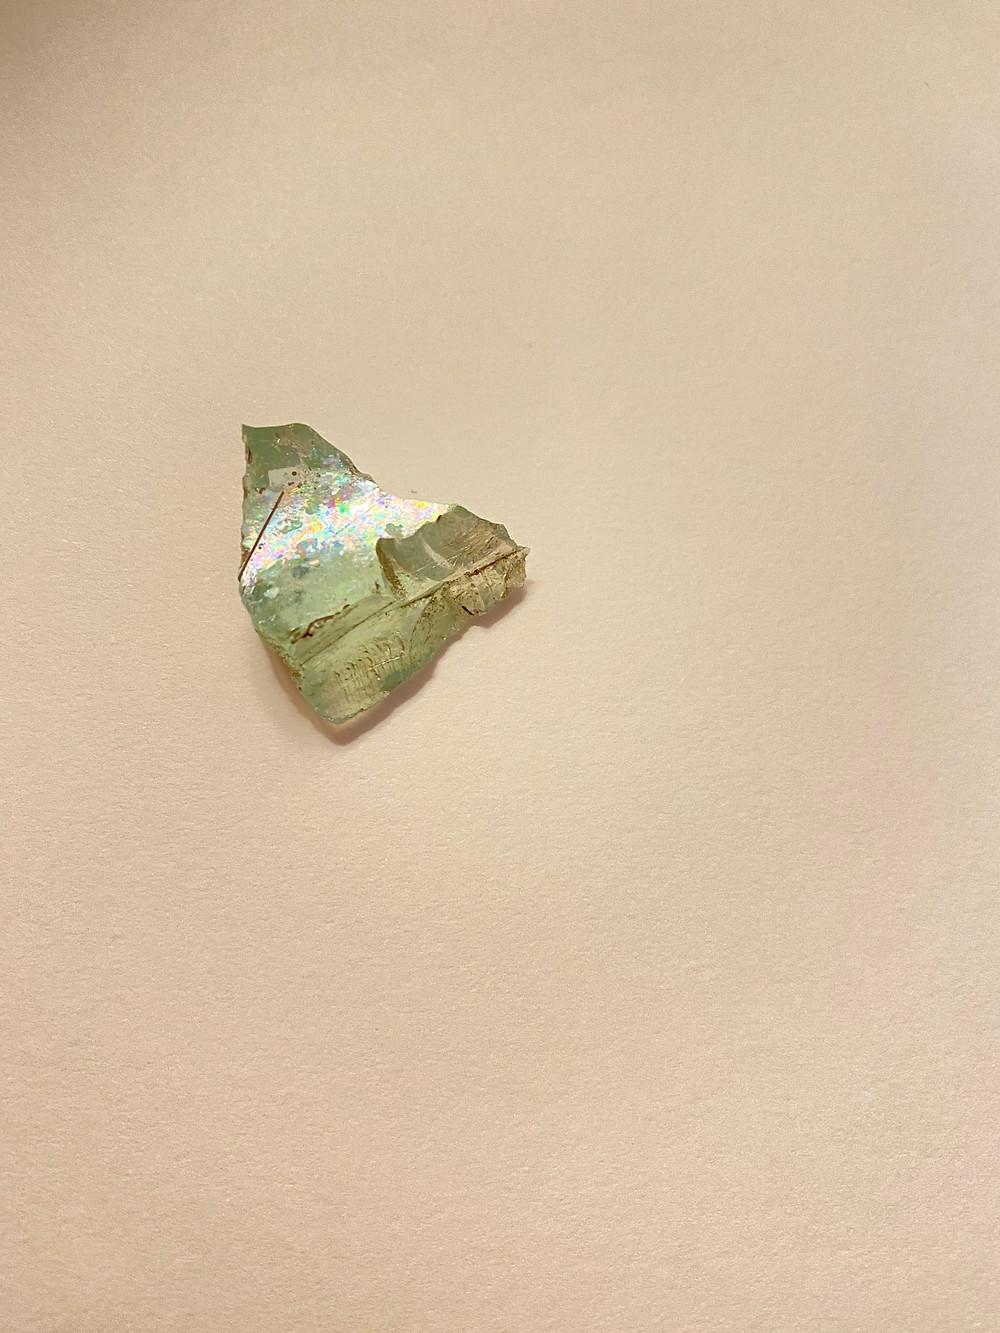 Iridescent glass shard, found in a medieval churchyard garden, Norwich